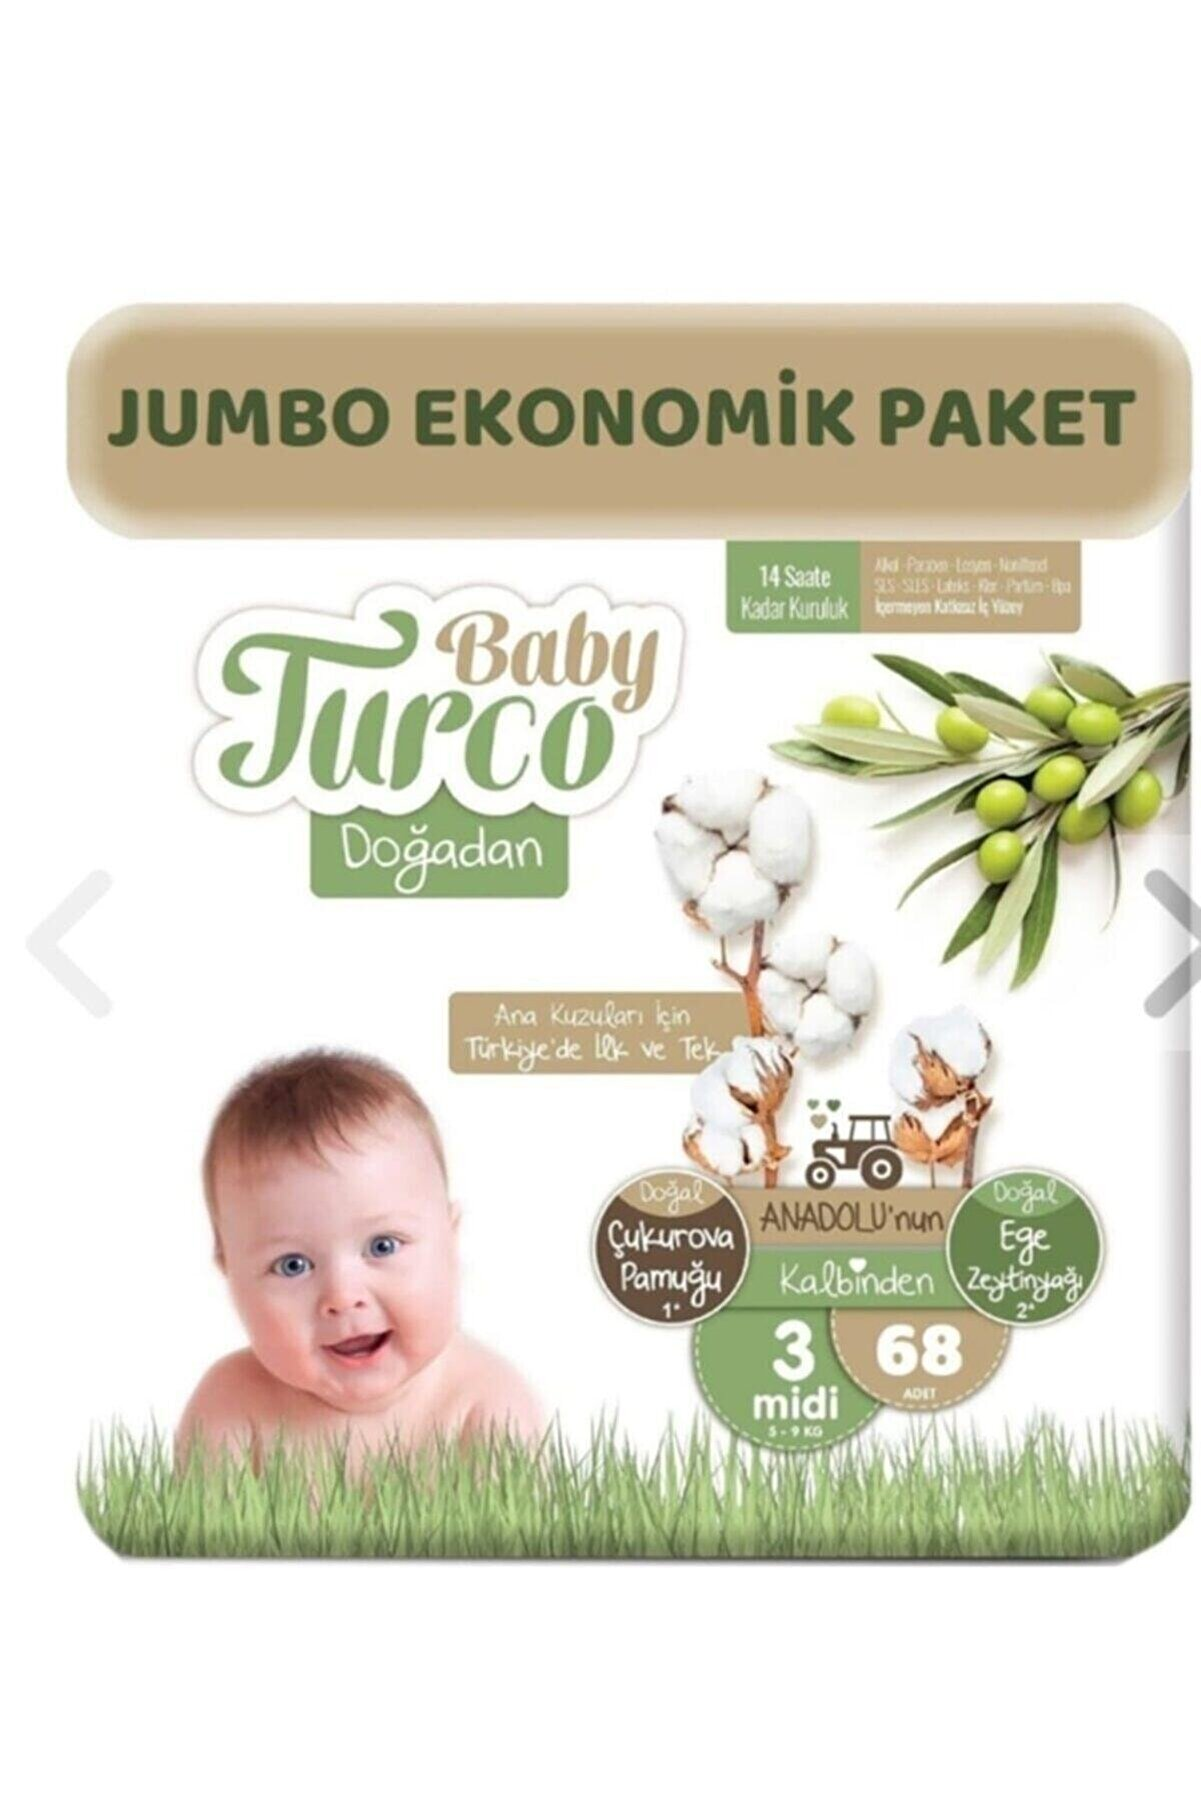 Baby Turco Doğadan Hesaplı Paket 3no 68'li